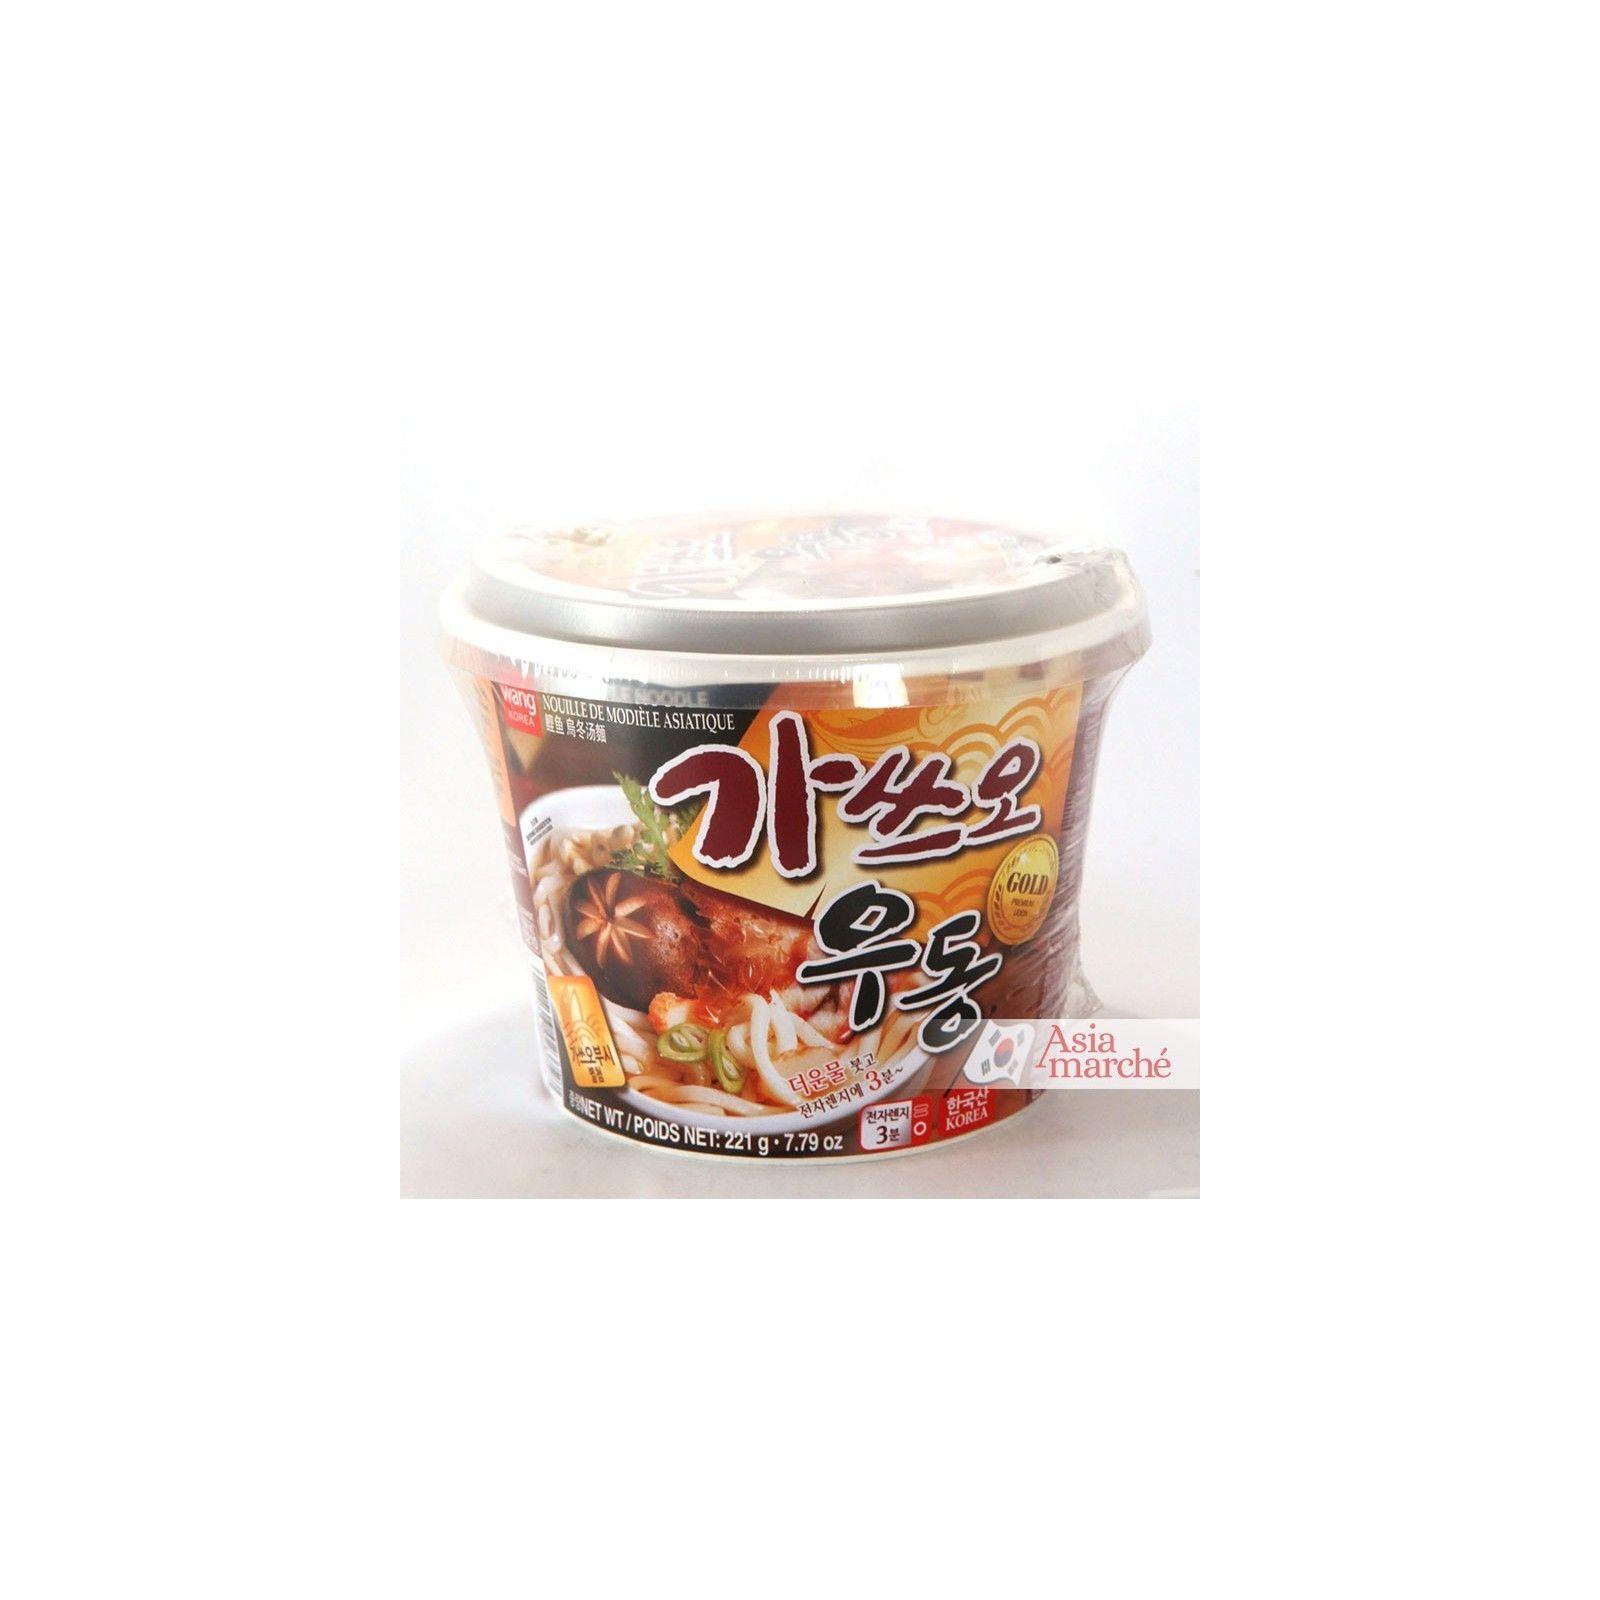 Asia Marché Soupe Udon Katsuo Bonite en bol de 221g Wang